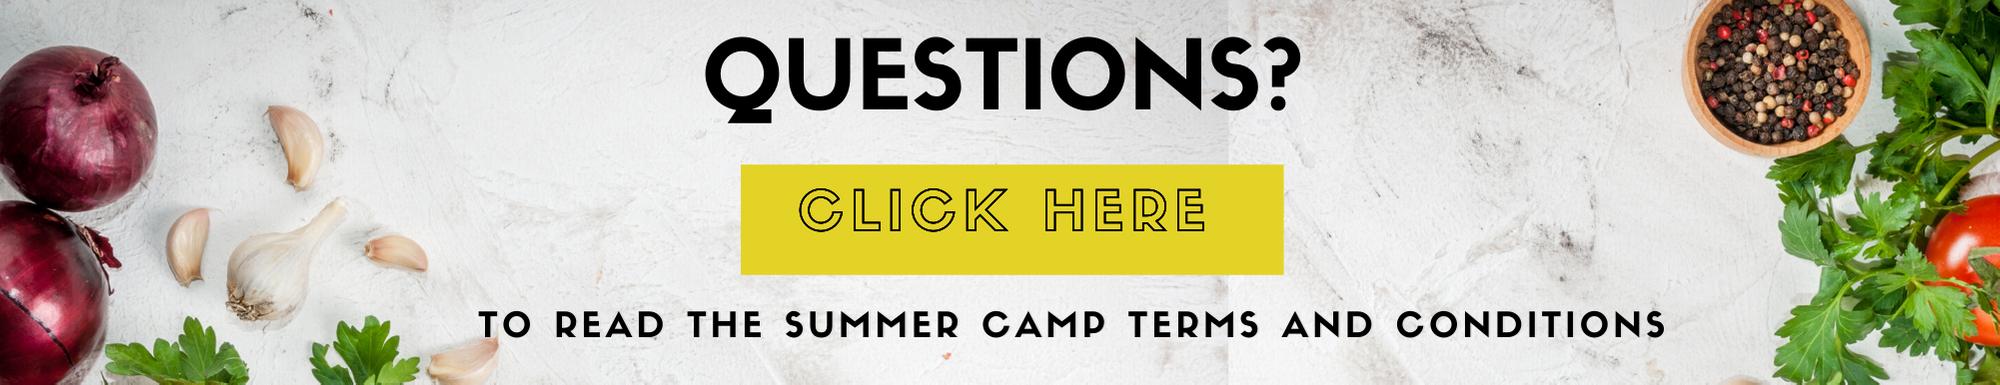 summer-camp-questions-.png